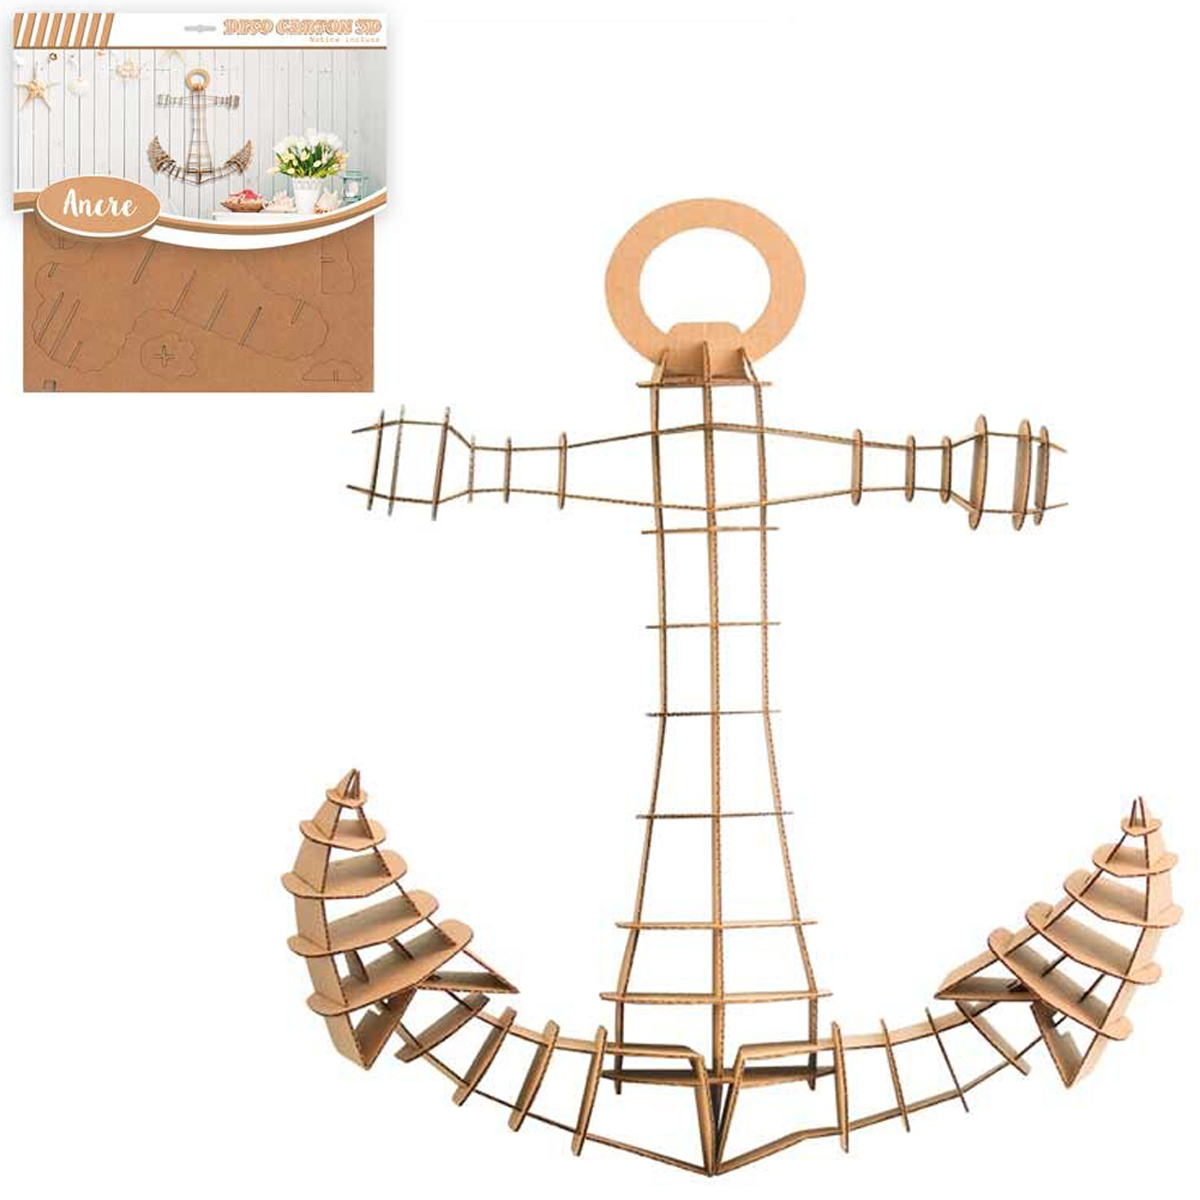 Figurine carton 3D \'Ancre Marine\' - planches 30x305 cm - [Q3142]